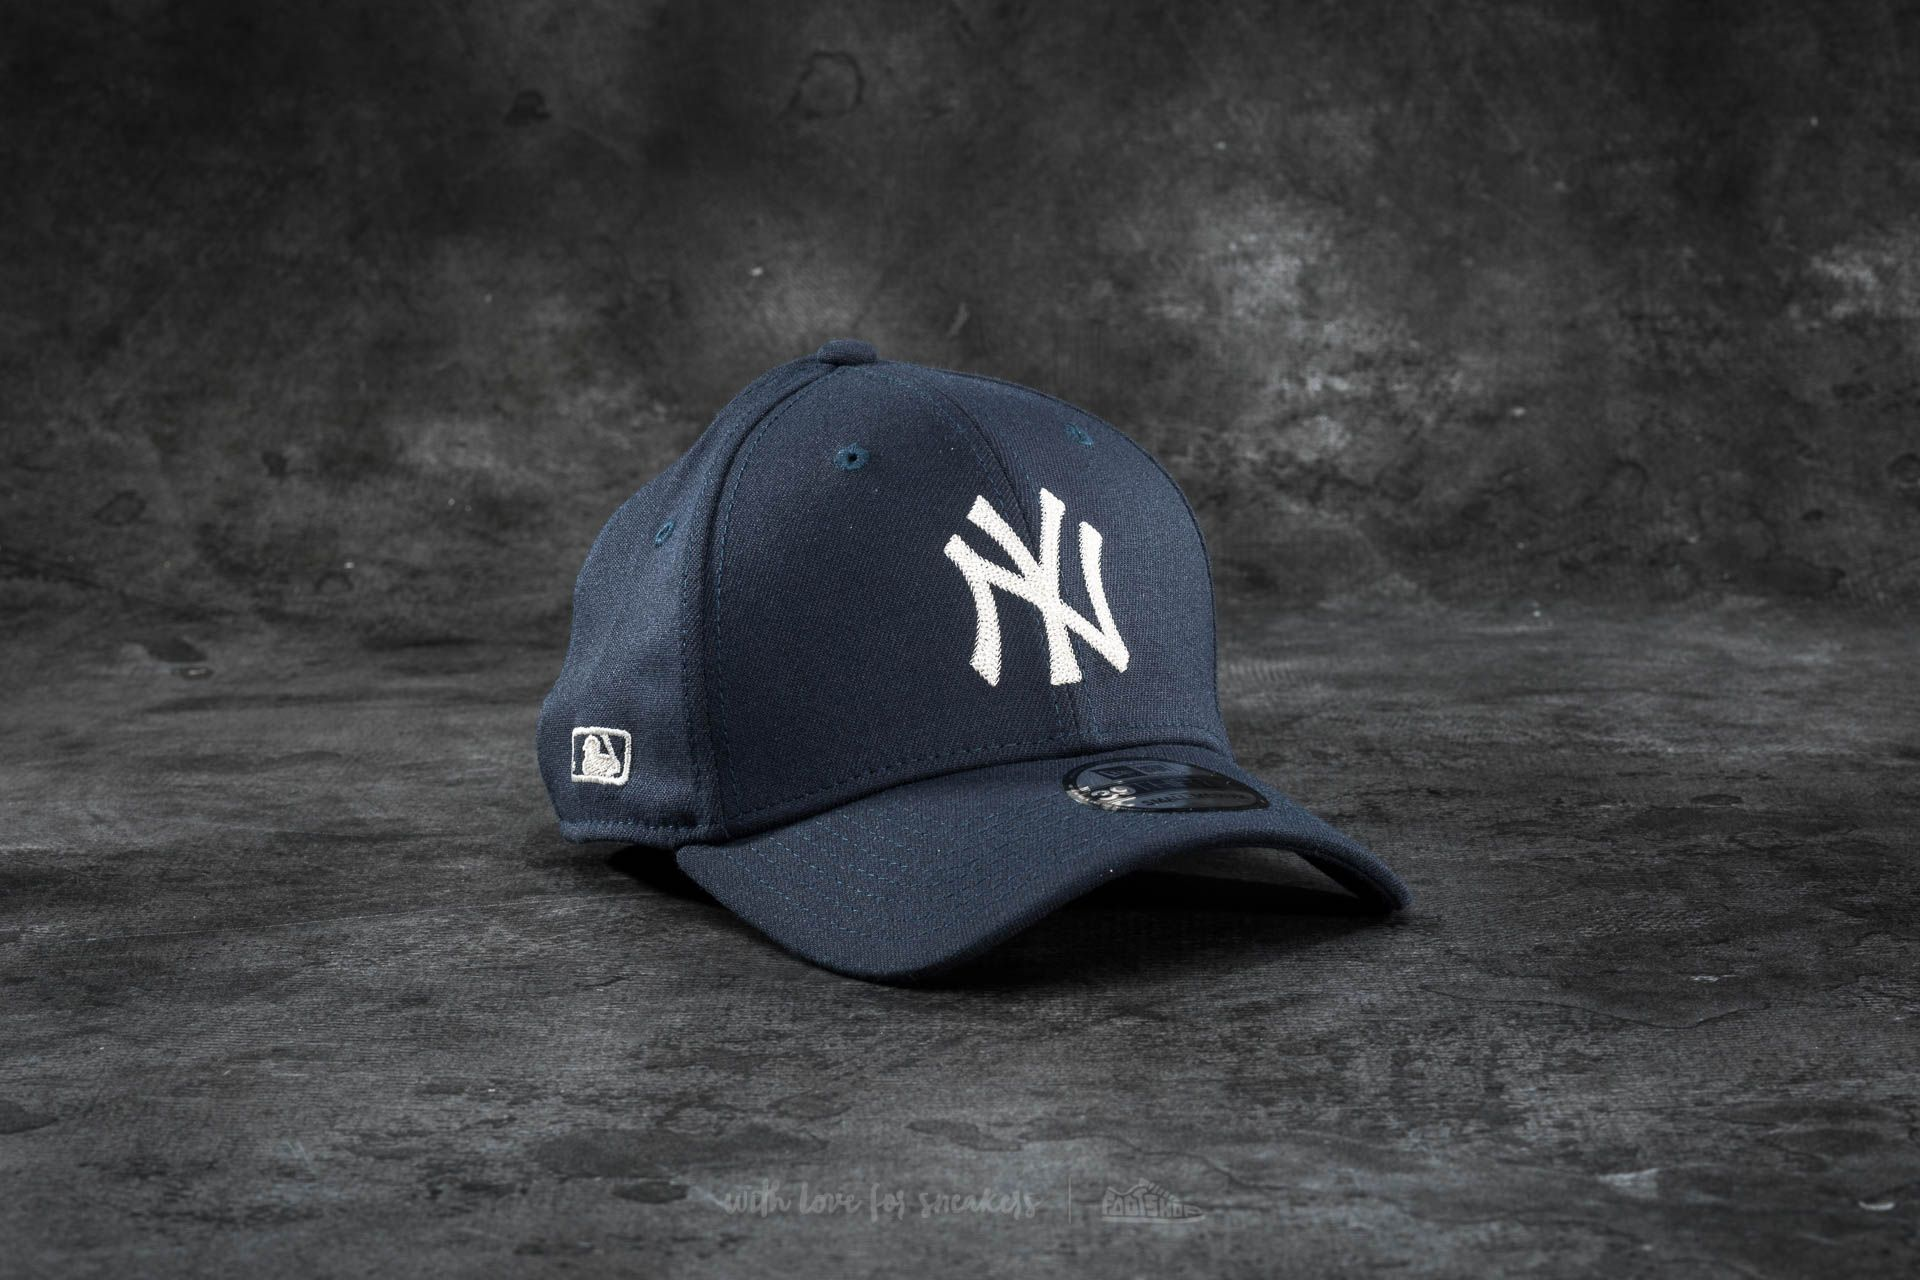 c5428f106fda3 New Era 39Thirty Chain Stitch Stretch New York Yankees Cap Navy ...